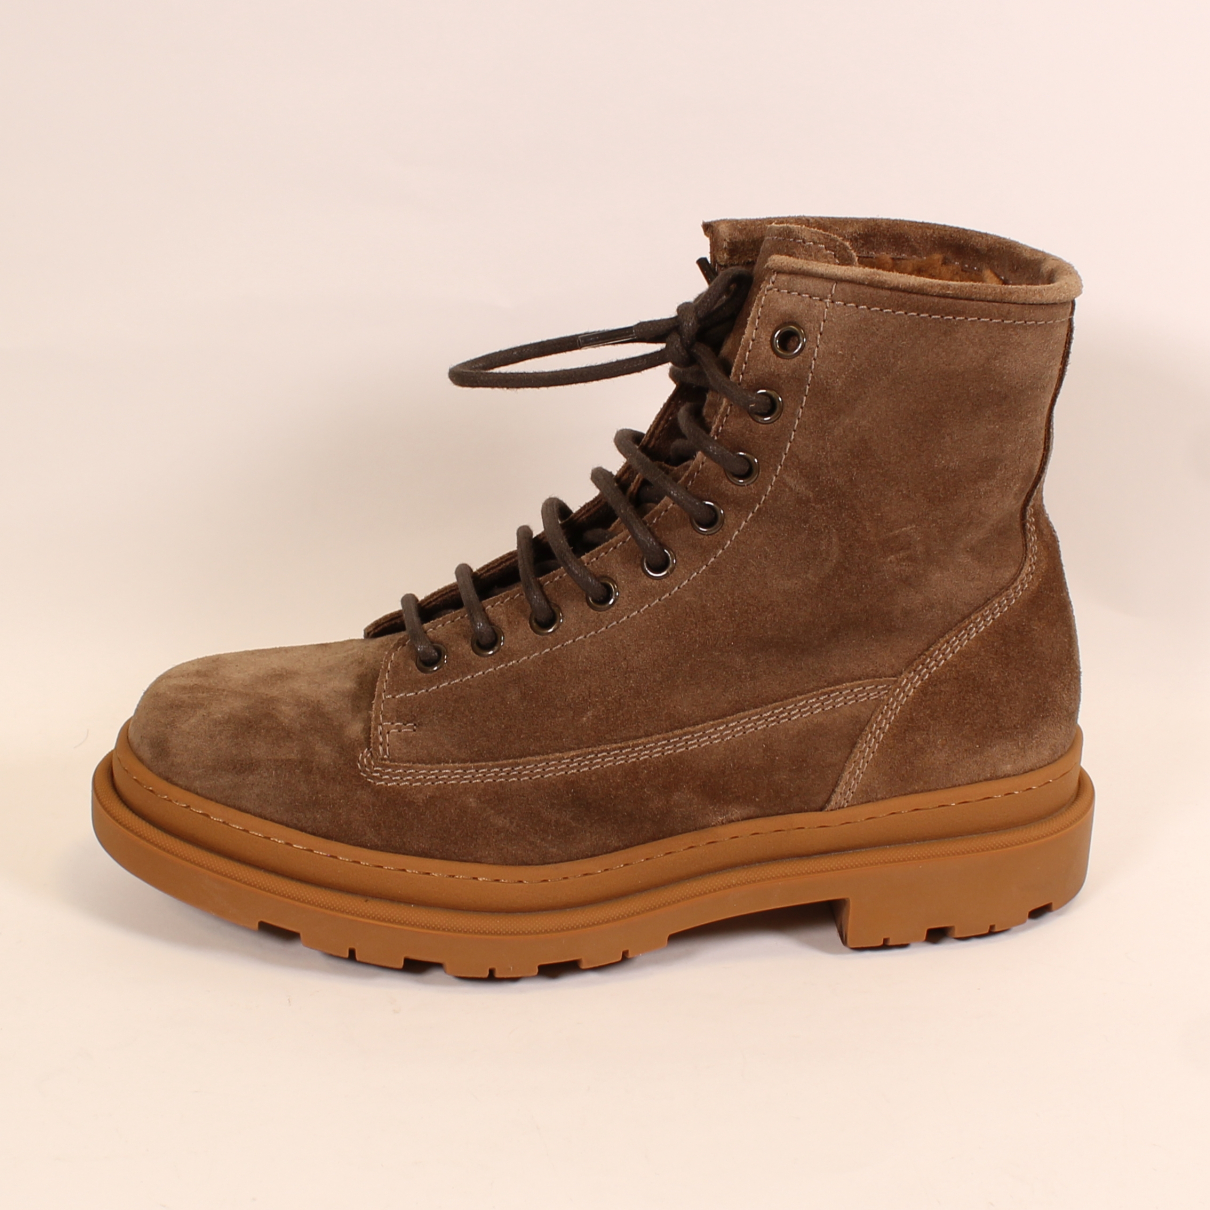 Brunello Cucinelli N Brown Suede Boots for Men 40 EU